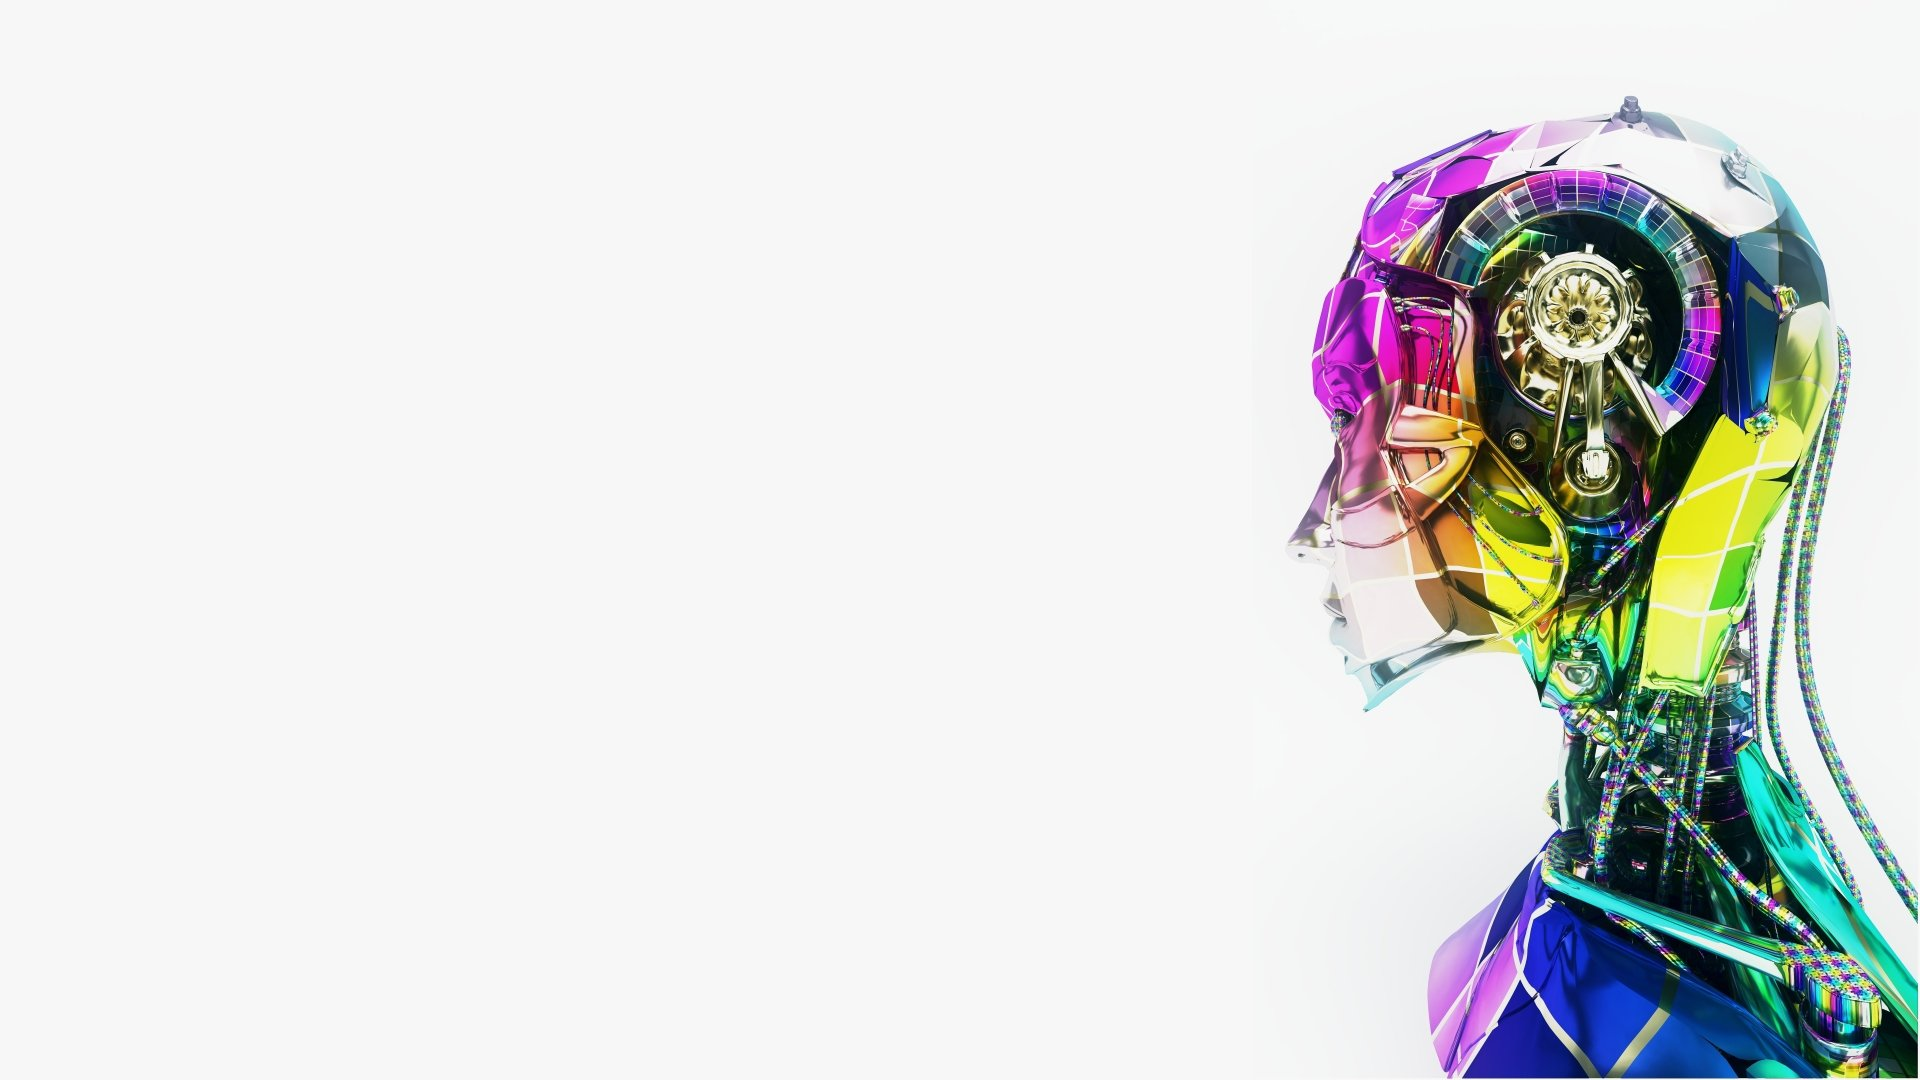 Sci Fi - Cyborg  Wallpaper